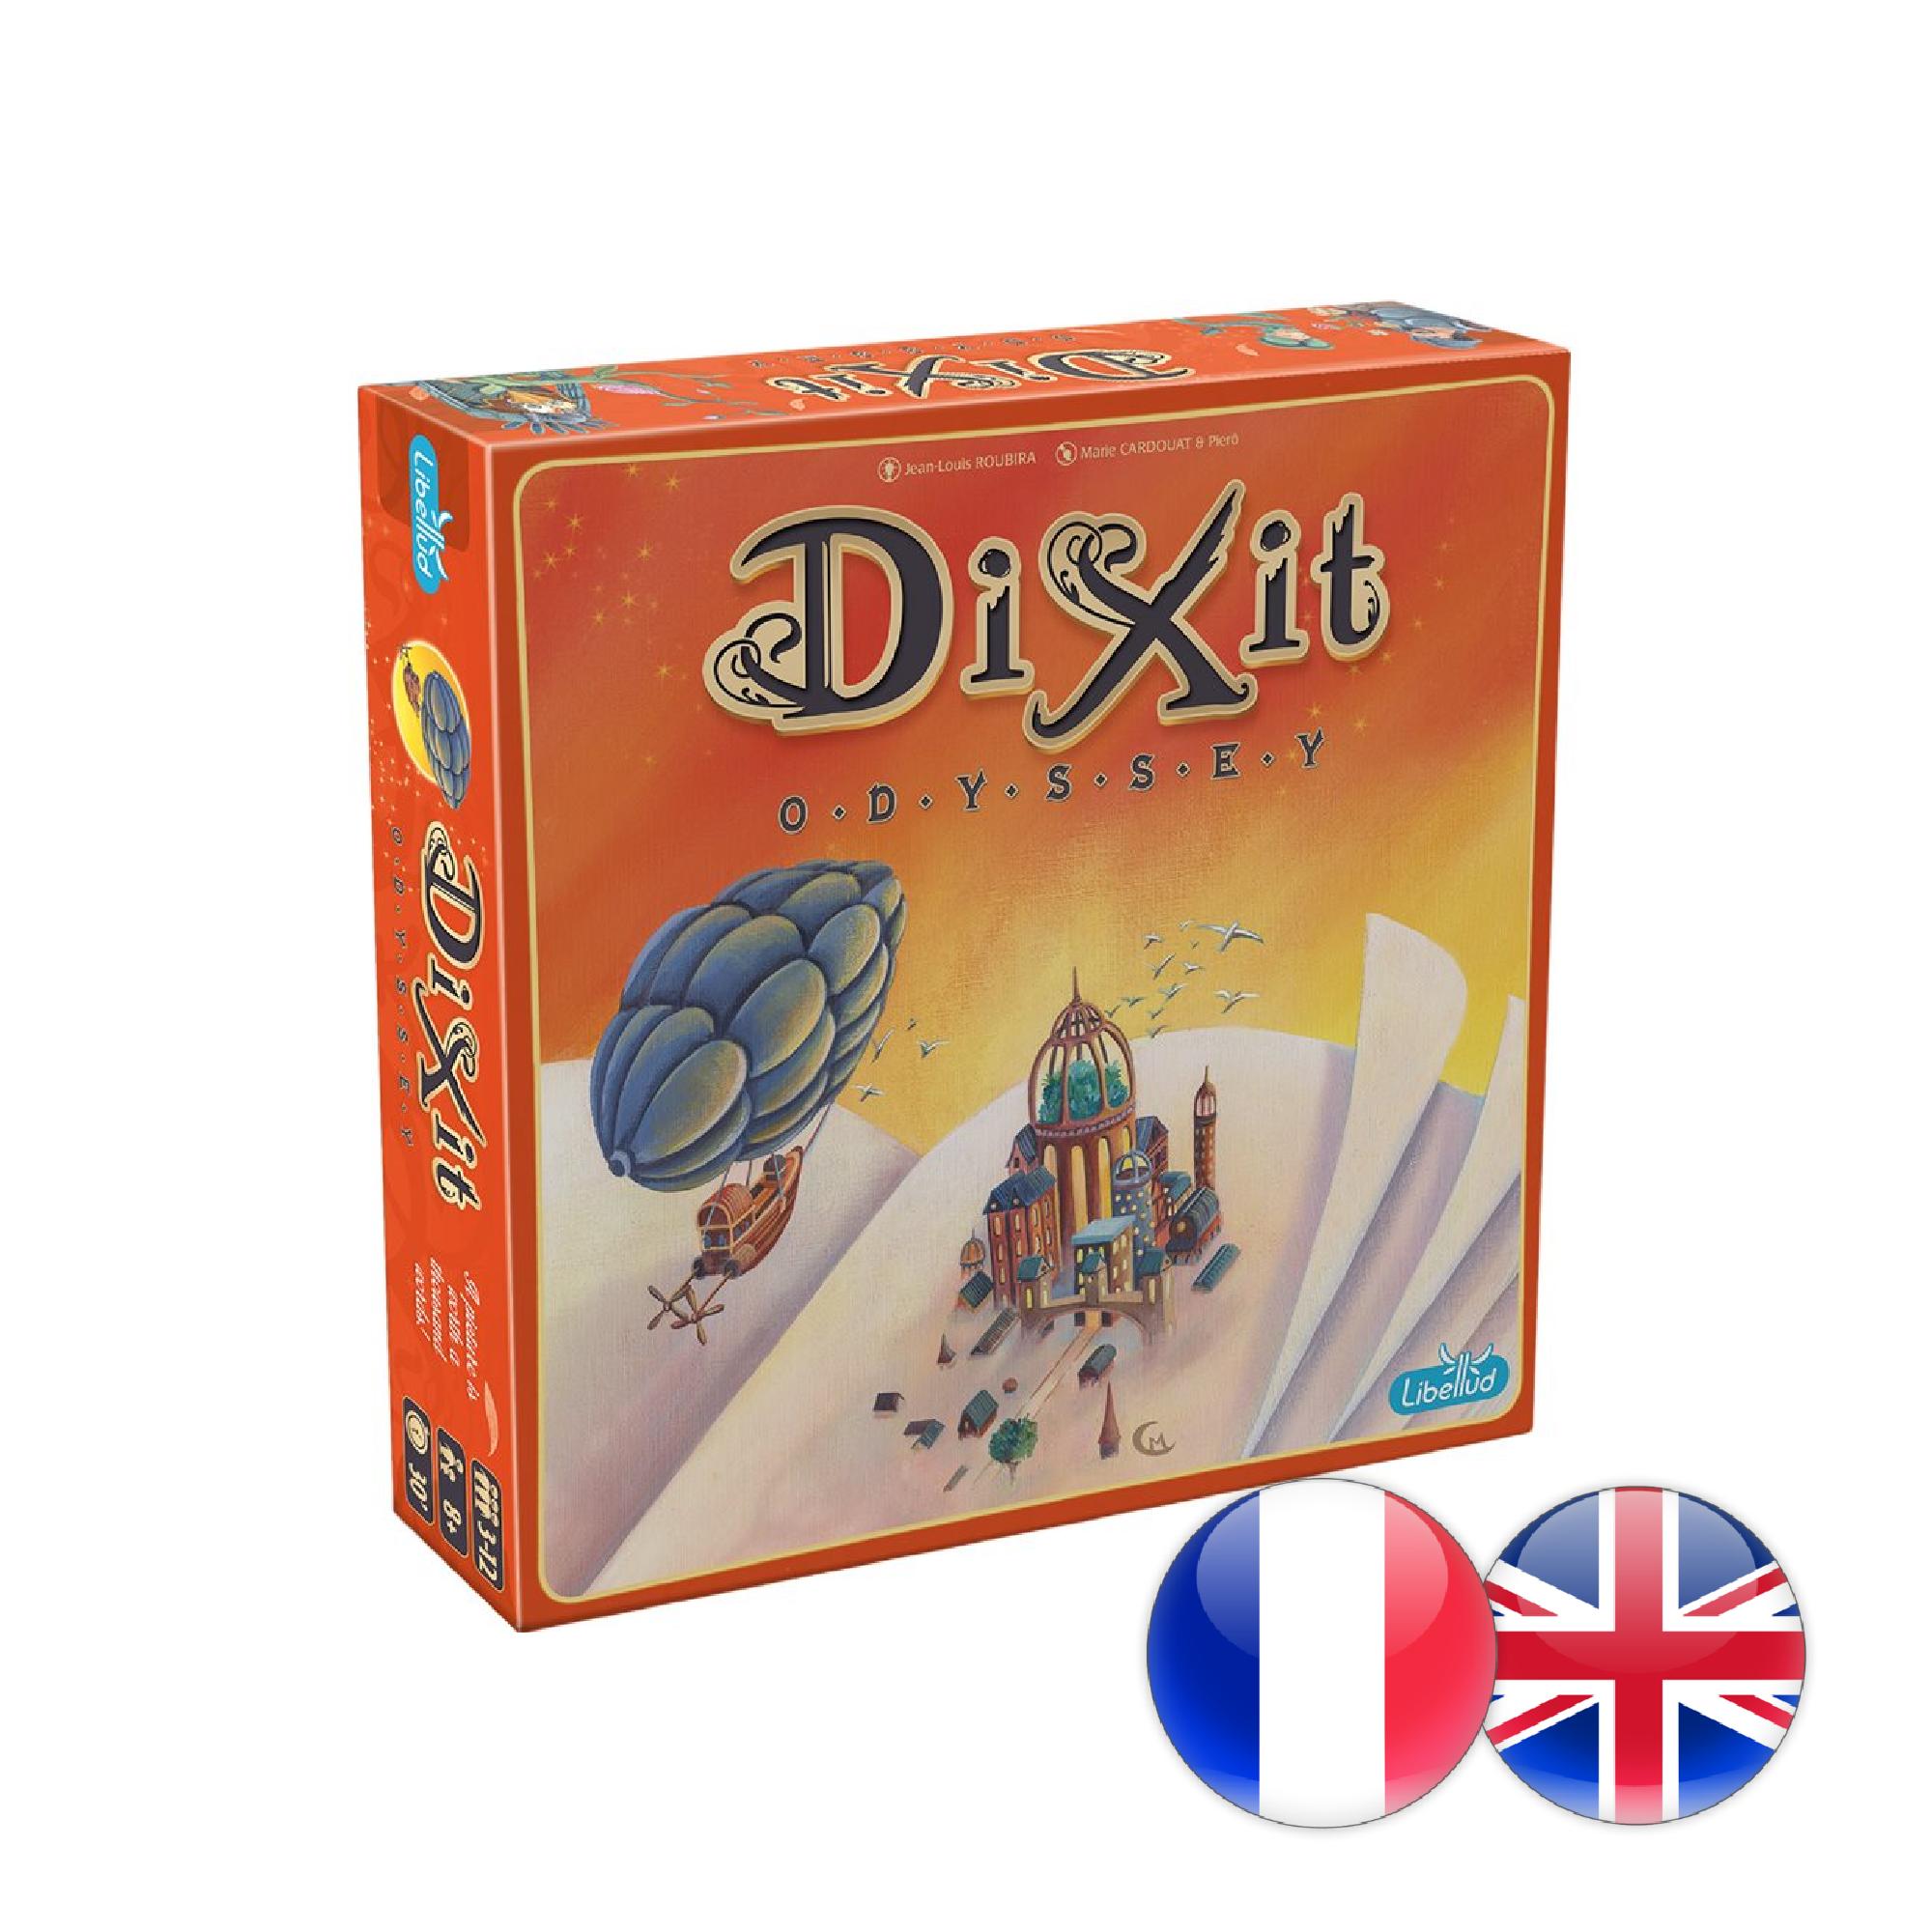 Libellud Dixit Odyssey (multi)